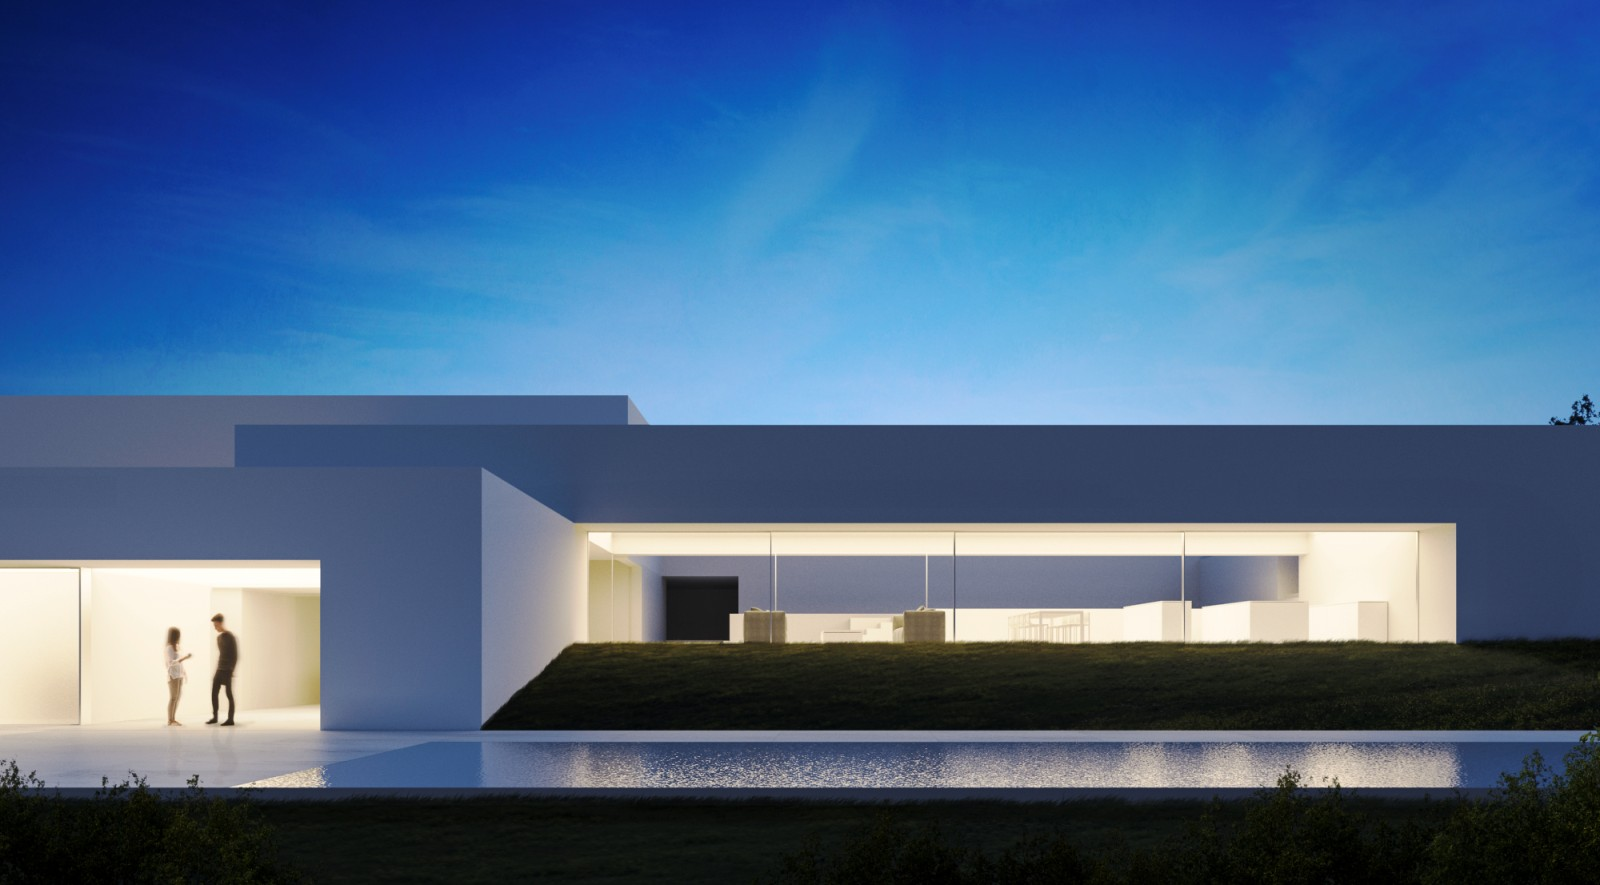 Zarid house by fran silvestre arquitectos a as architecture - Fran silvestre arquitectos ...